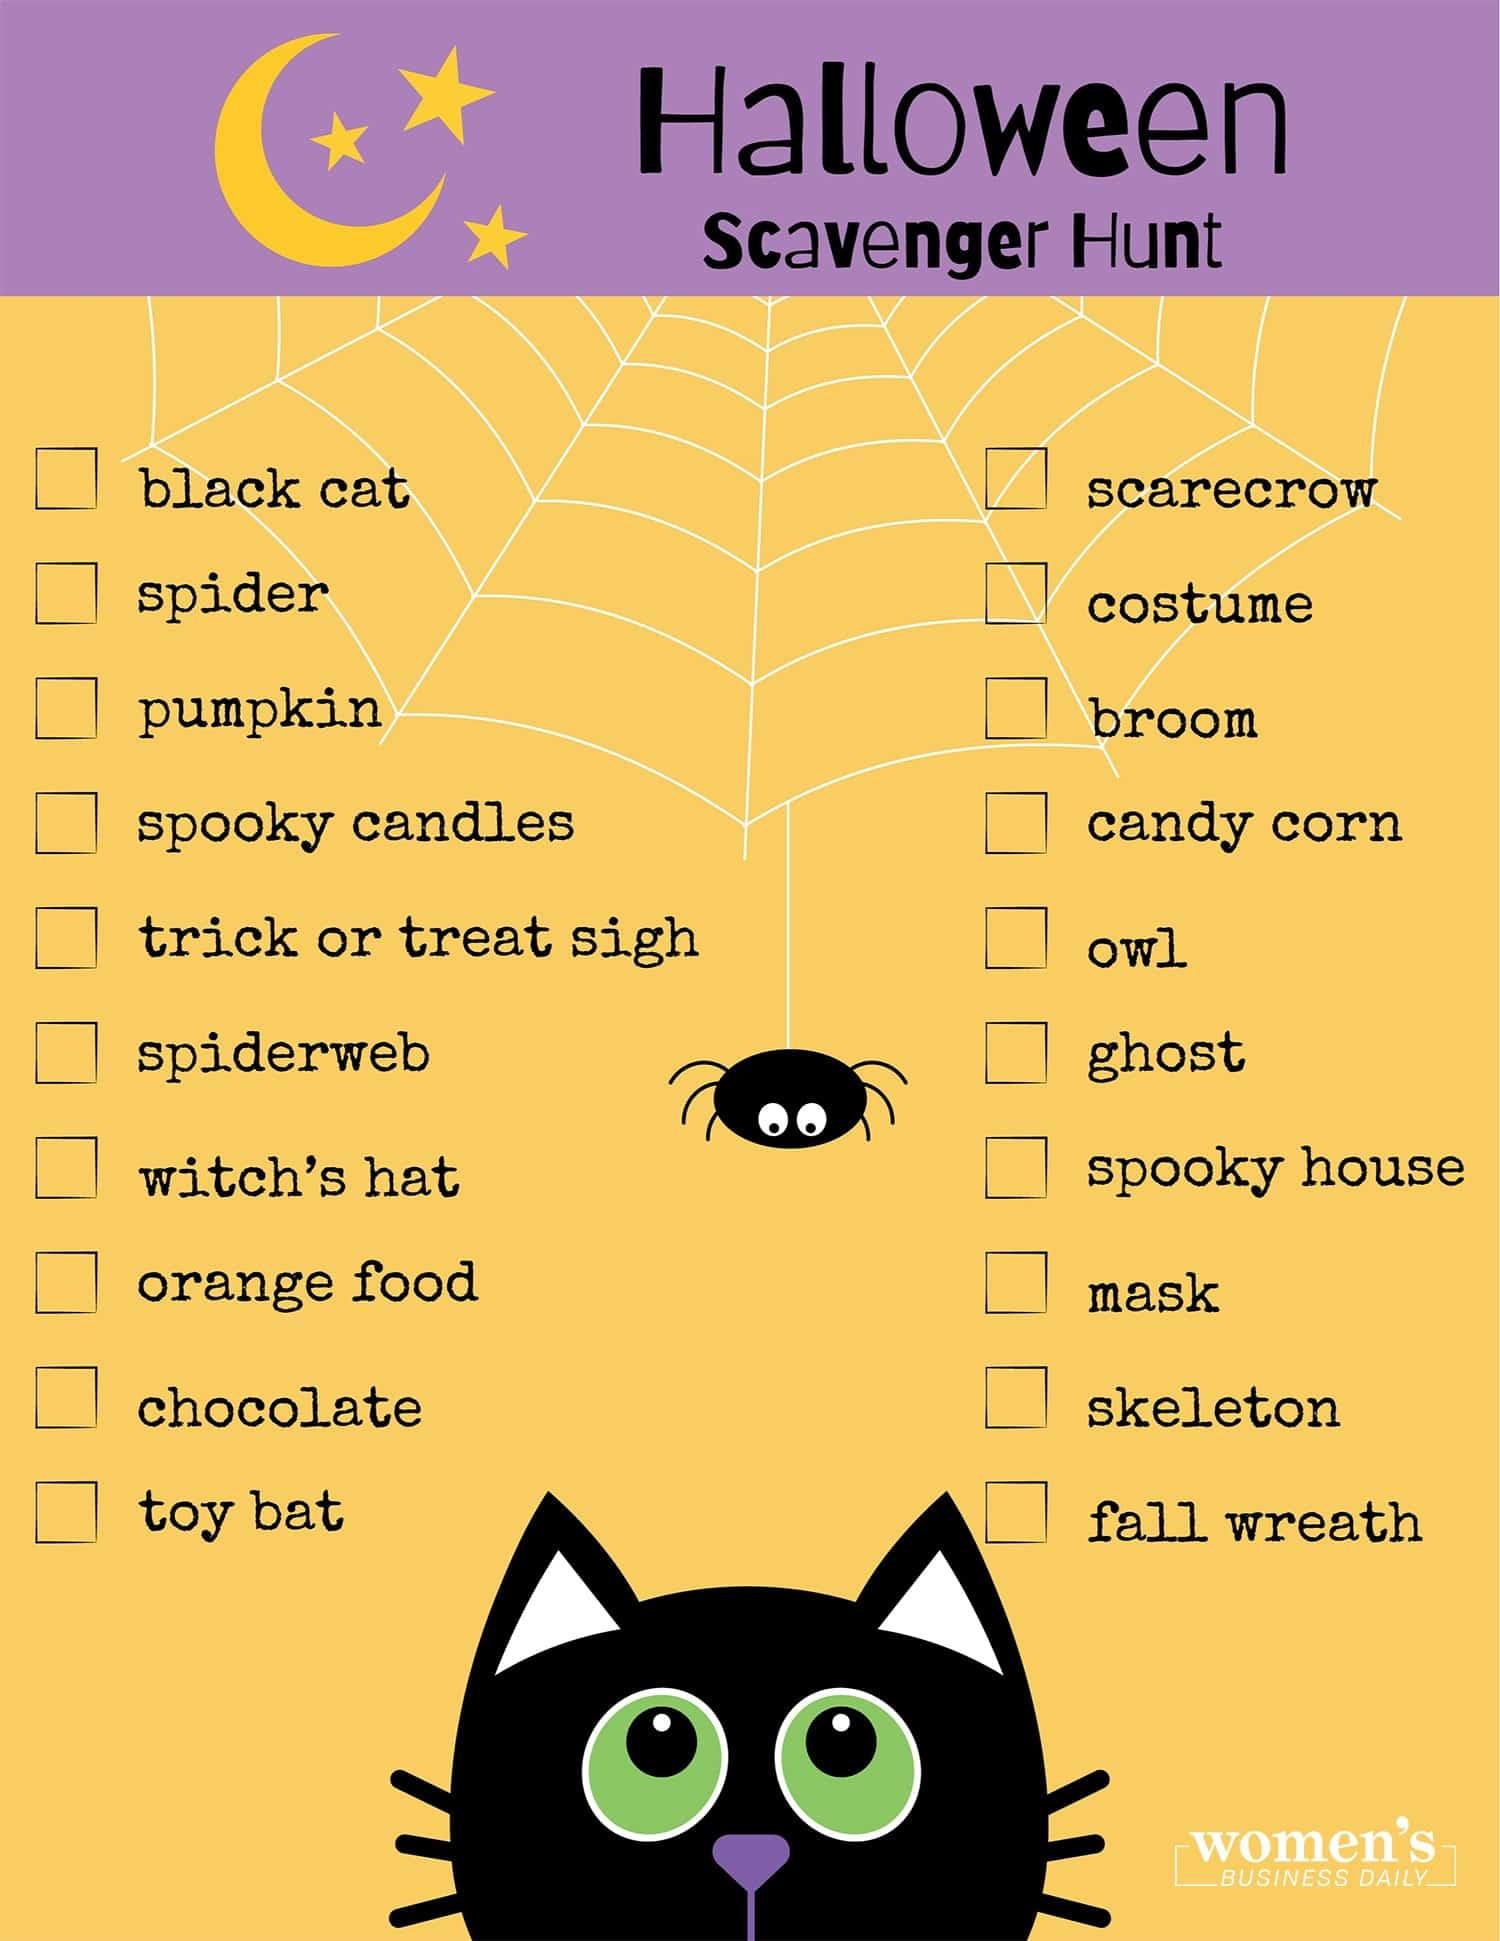 halloween scavenger hunt list